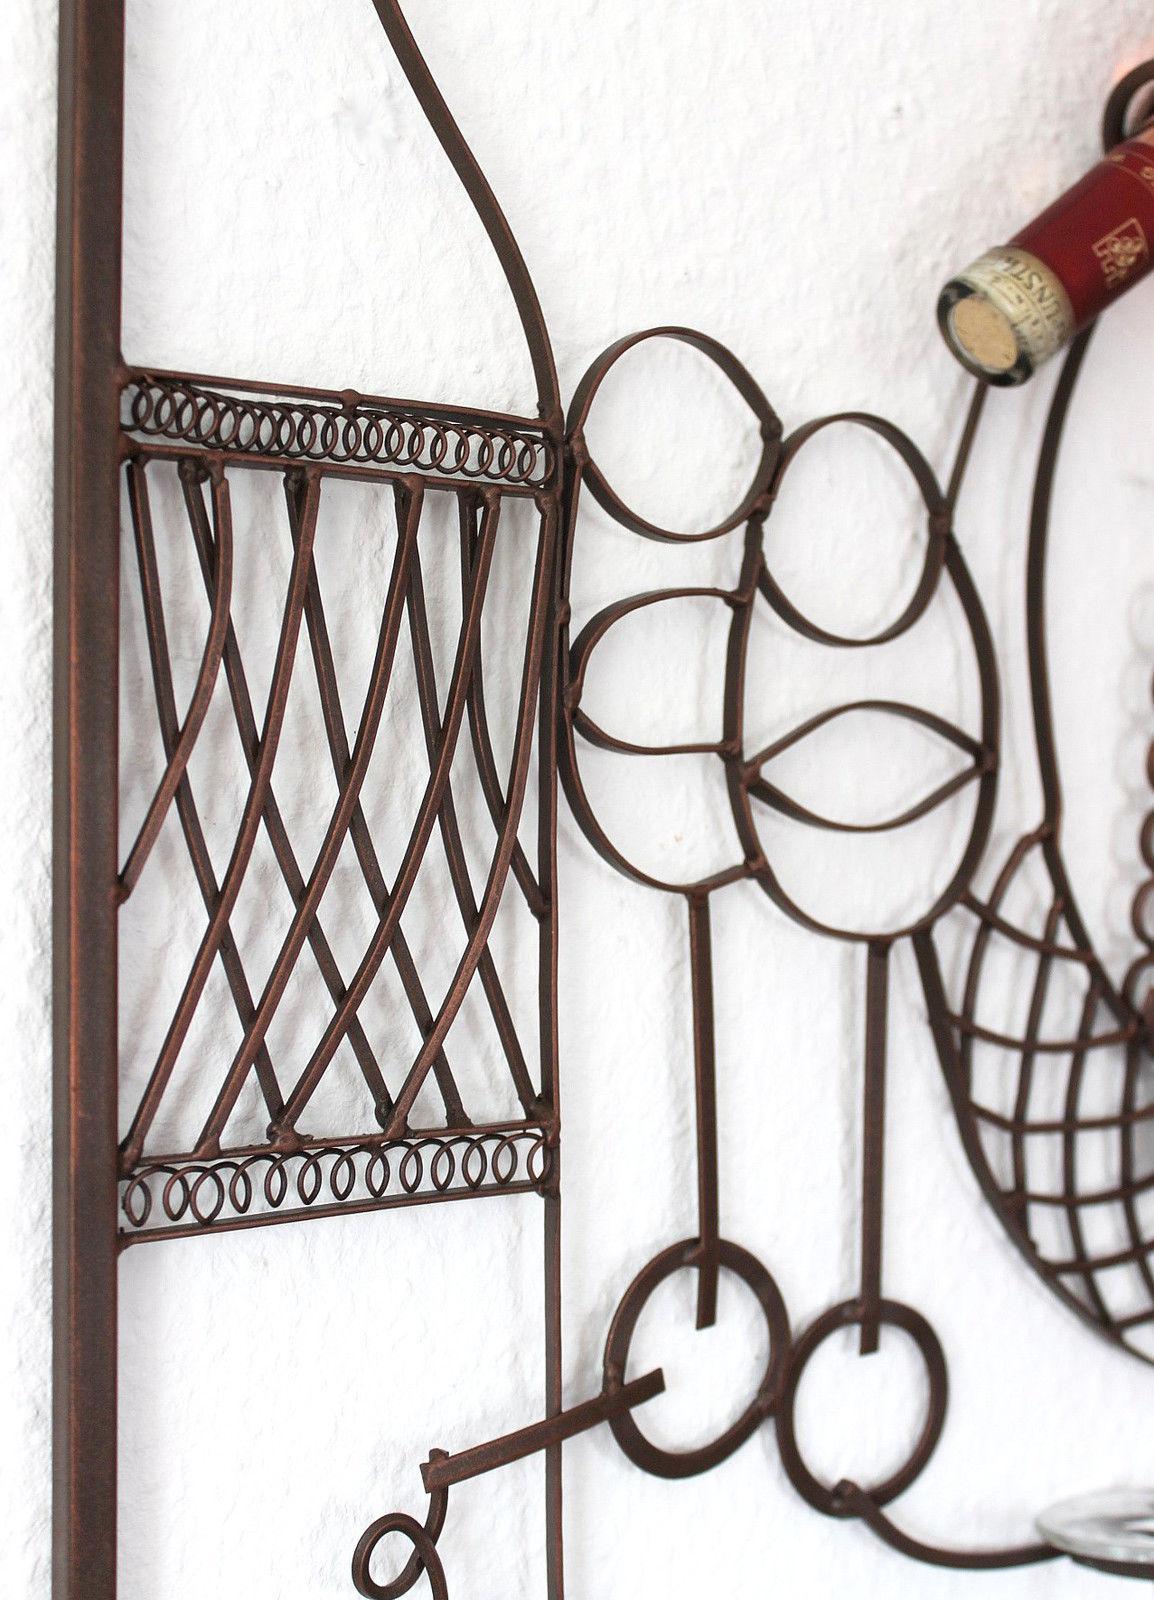 weinregal wandbild wand 091978 glashalter metall 65 cm flaschenhalter wandregal ebay. Black Bedroom Furniture Sets. Home Design Ideas